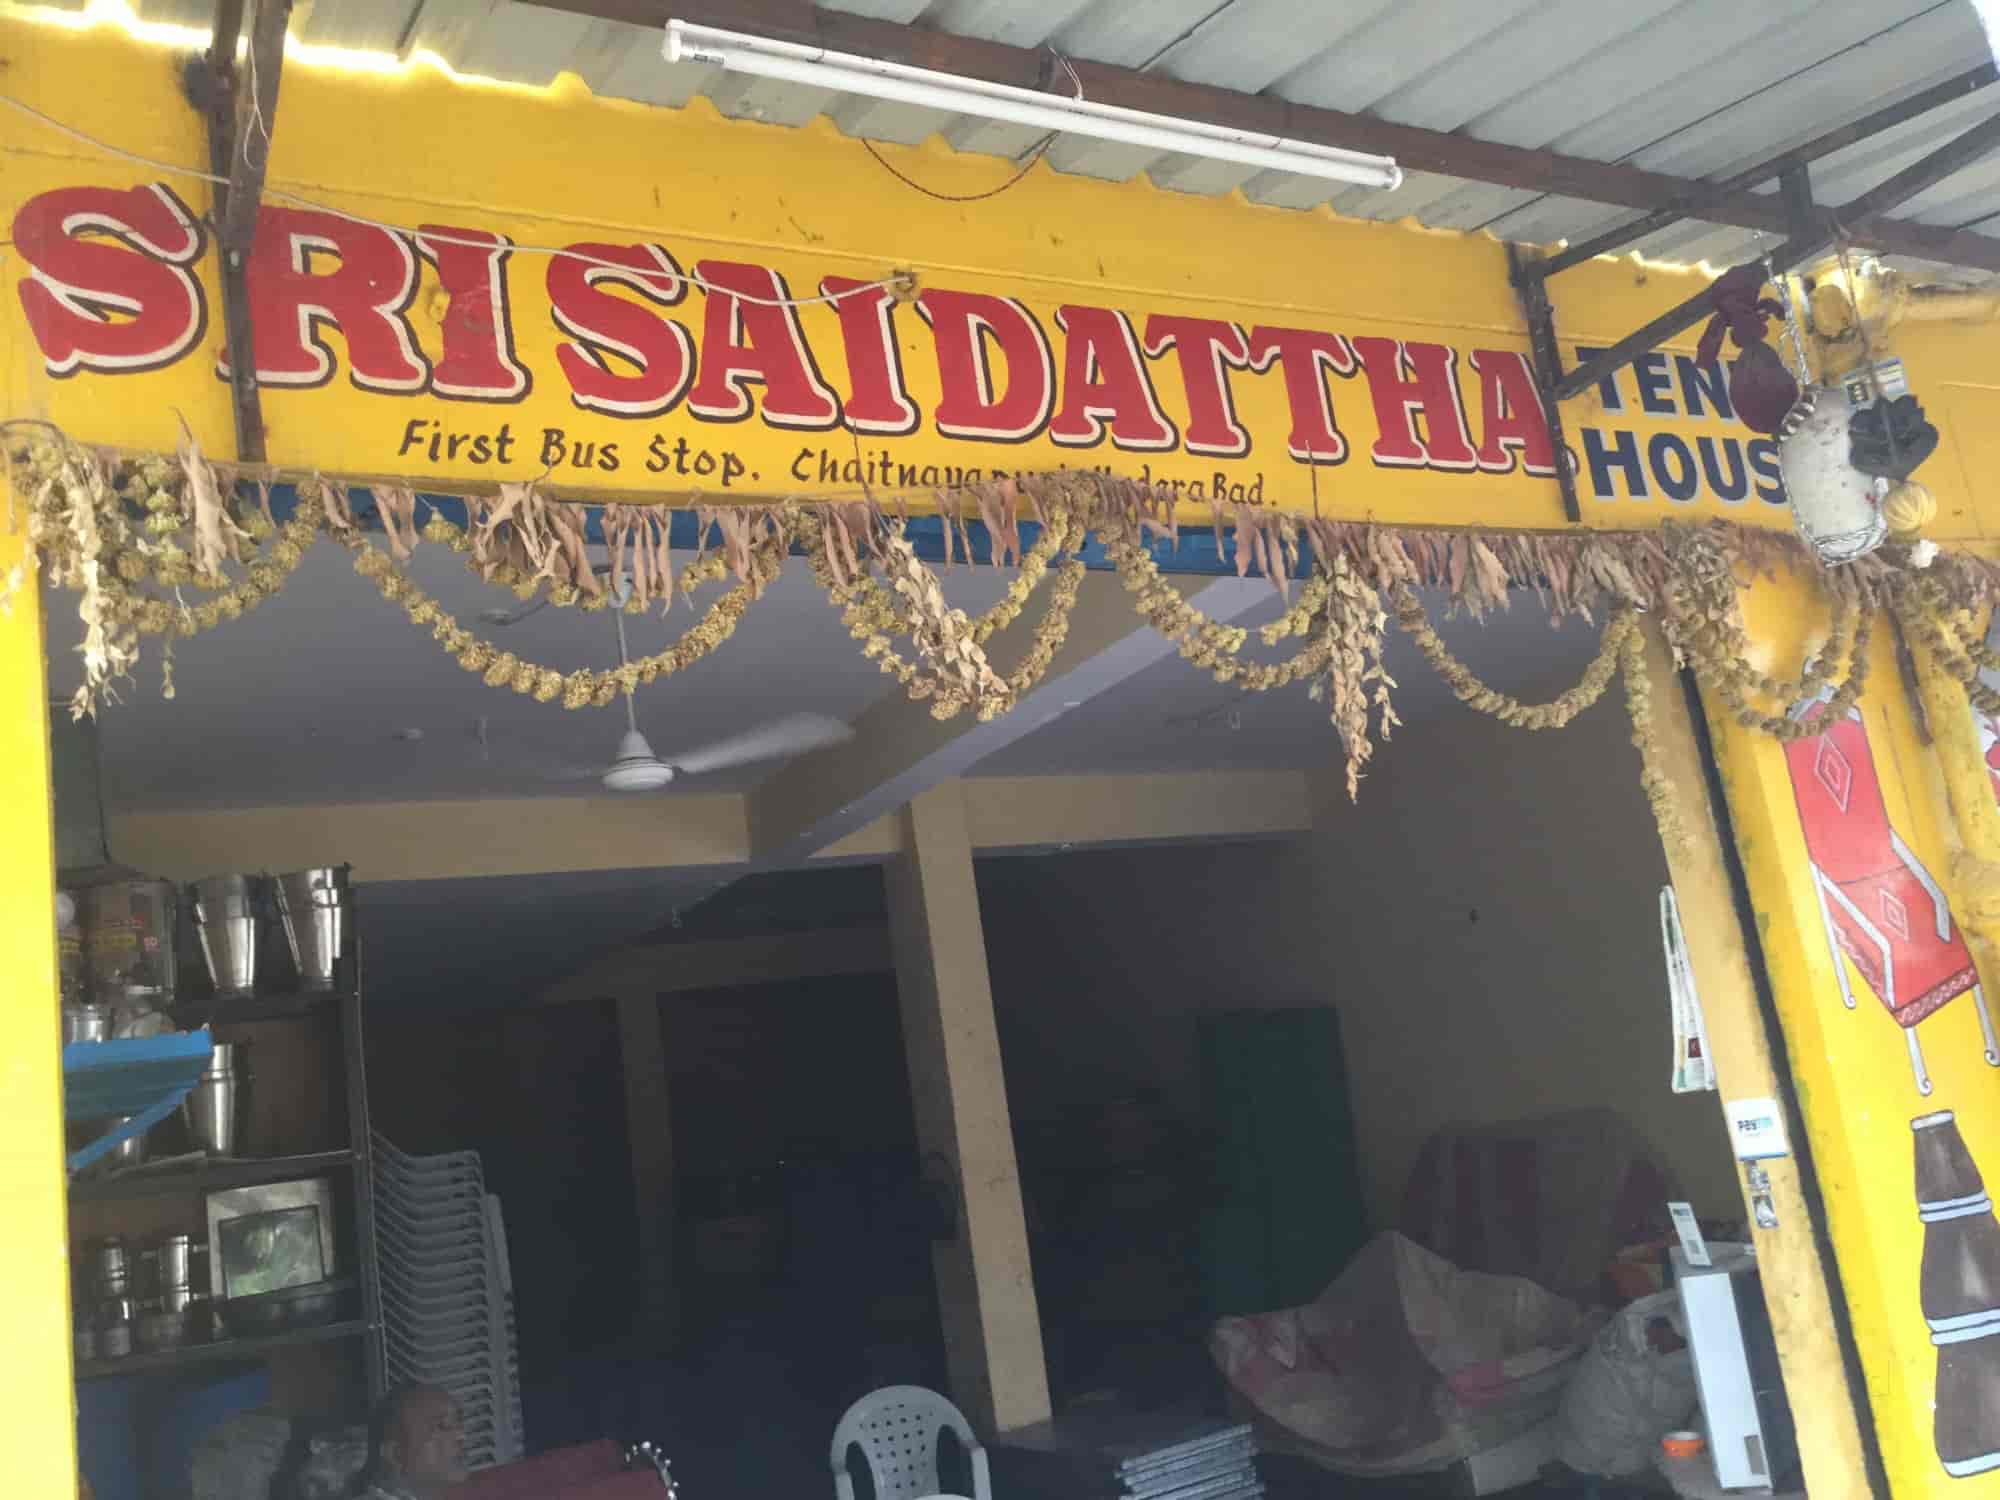 Sri Sai Datta Tent House & Sri Sai Datta Tent House Dilsukhnagar - Sri Sai Dutta Tent House ...